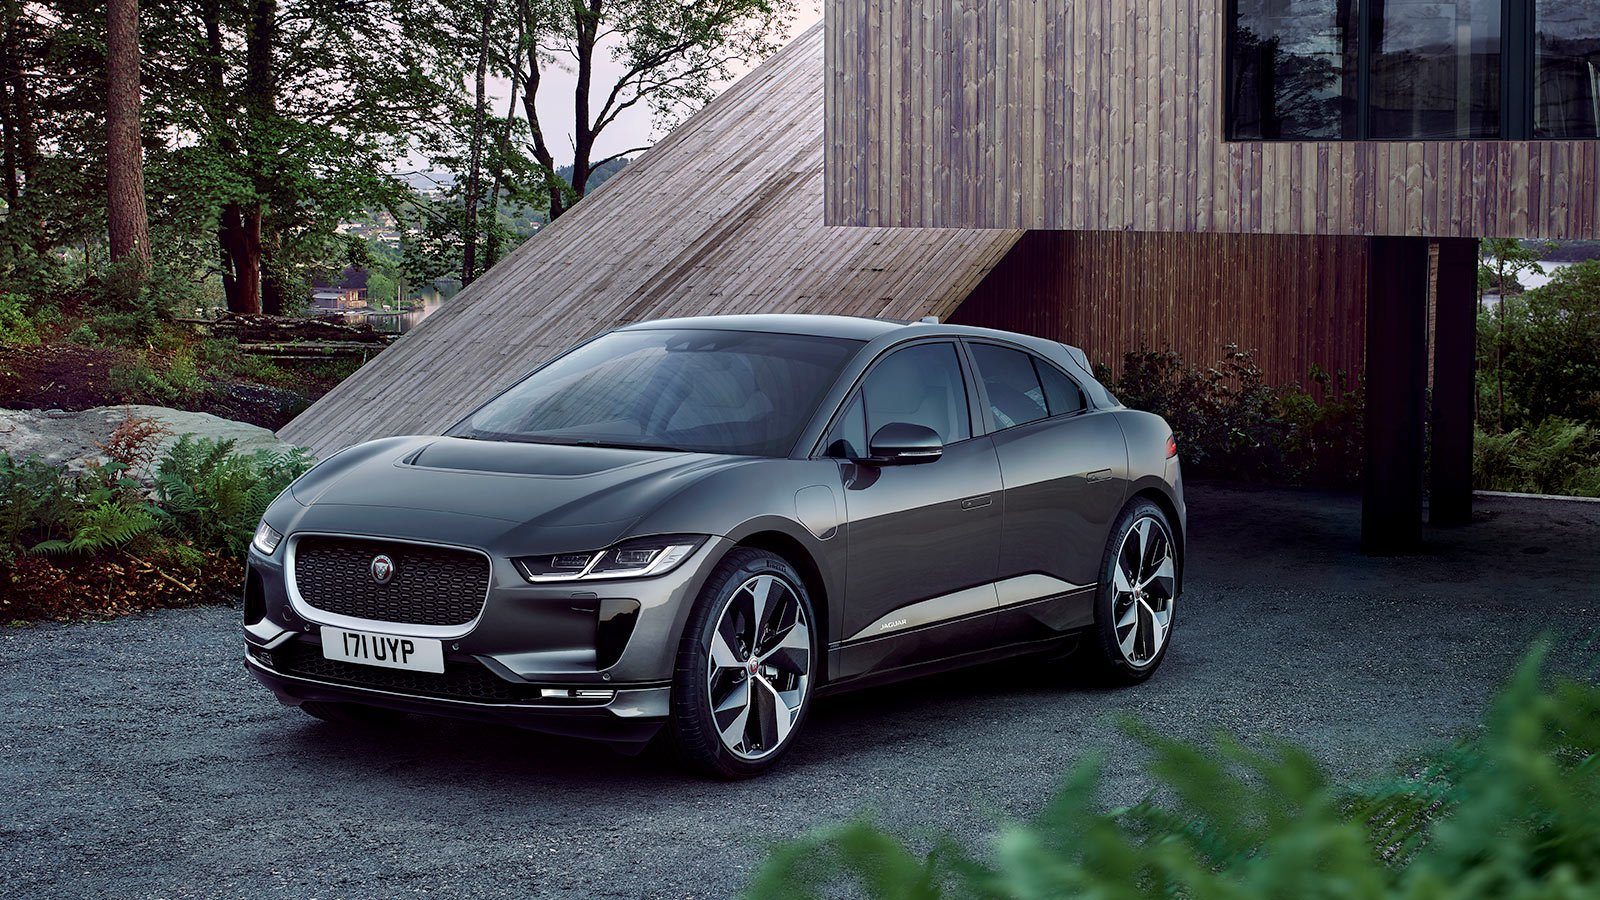 Jaguar I-Pace in Parking